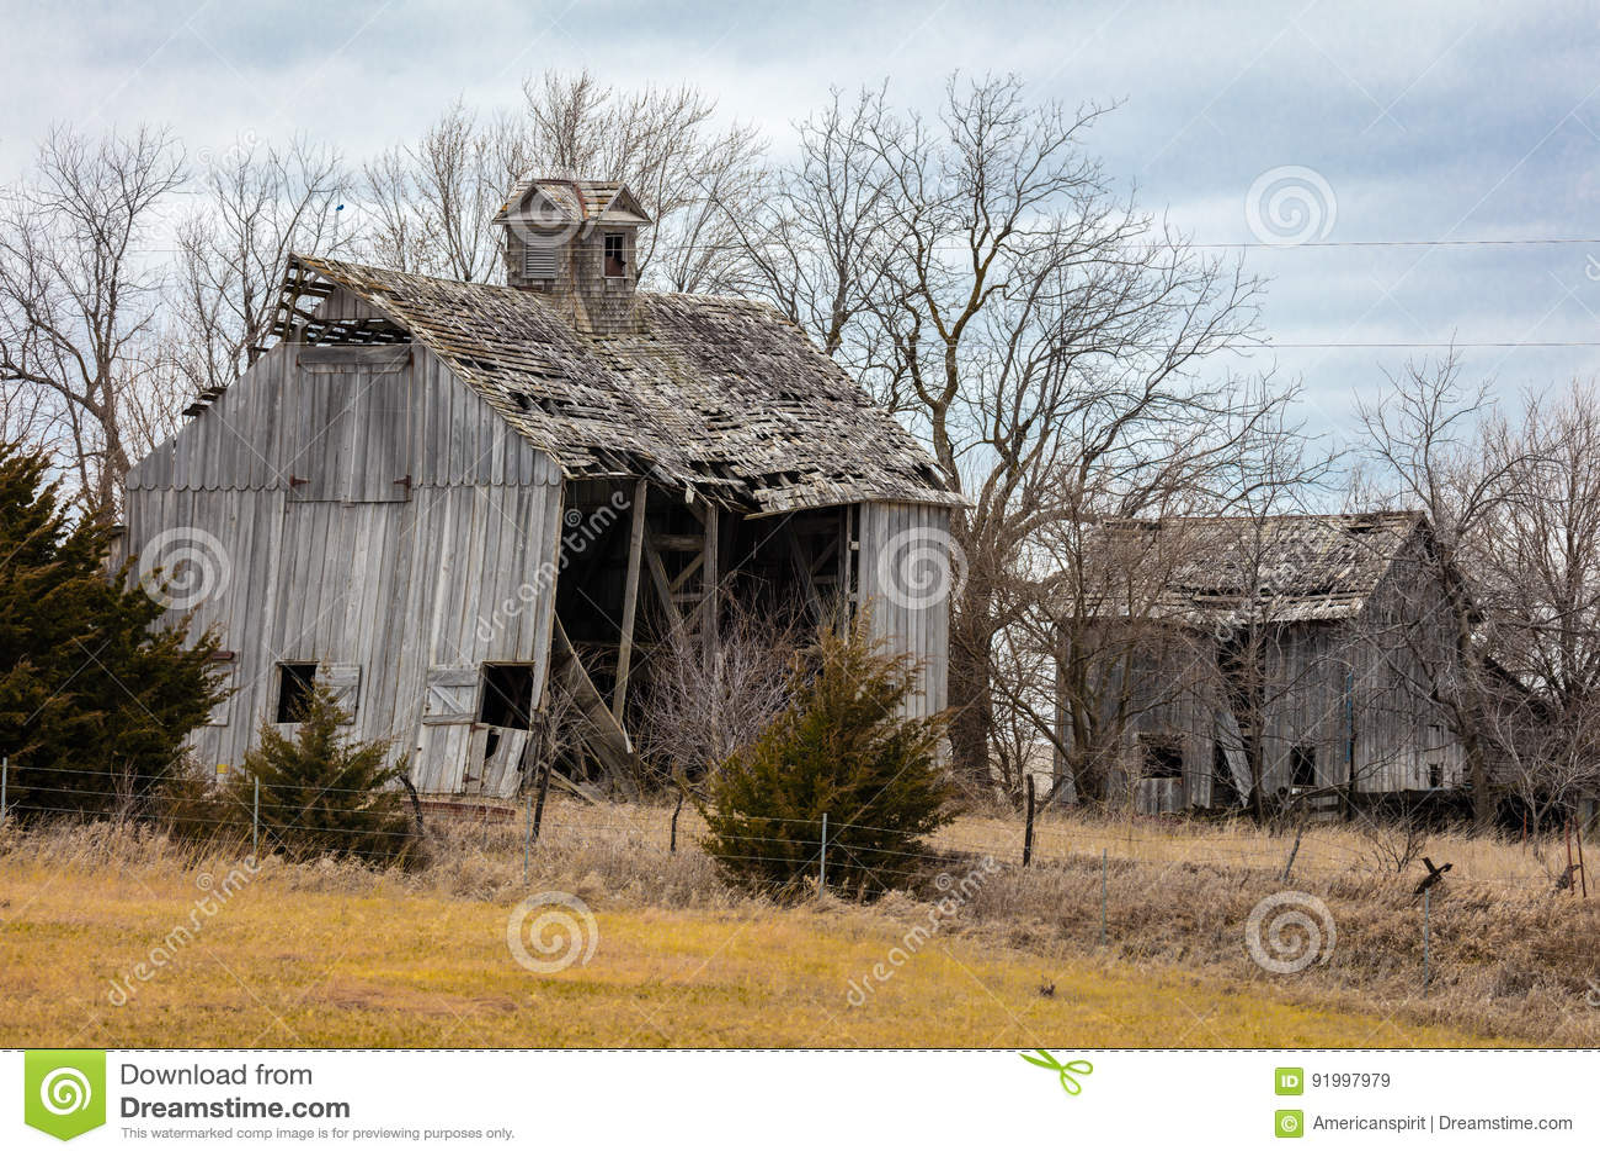 Old Falling down barn, Nebraska